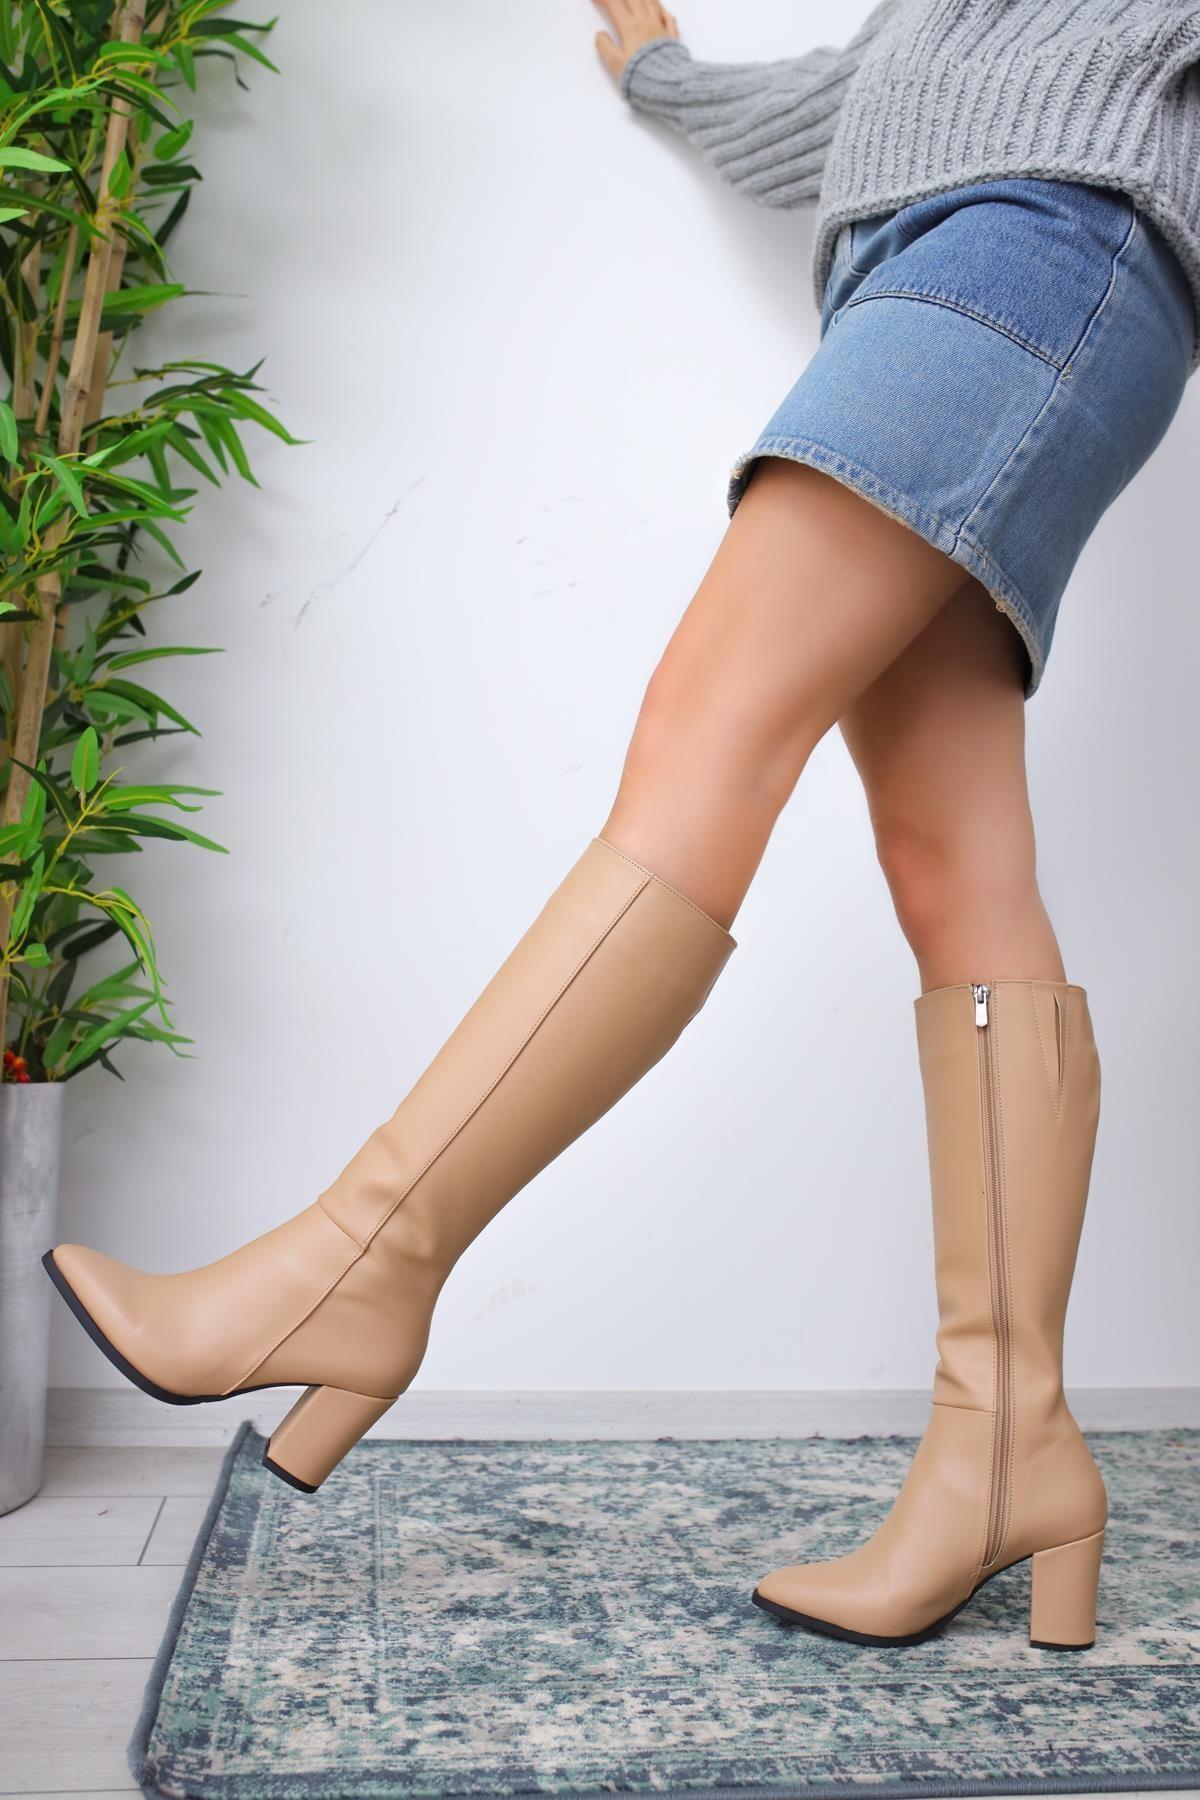 Limoya Tatum Nud Sivri Burunlu Orta Topuklu Çizme 2